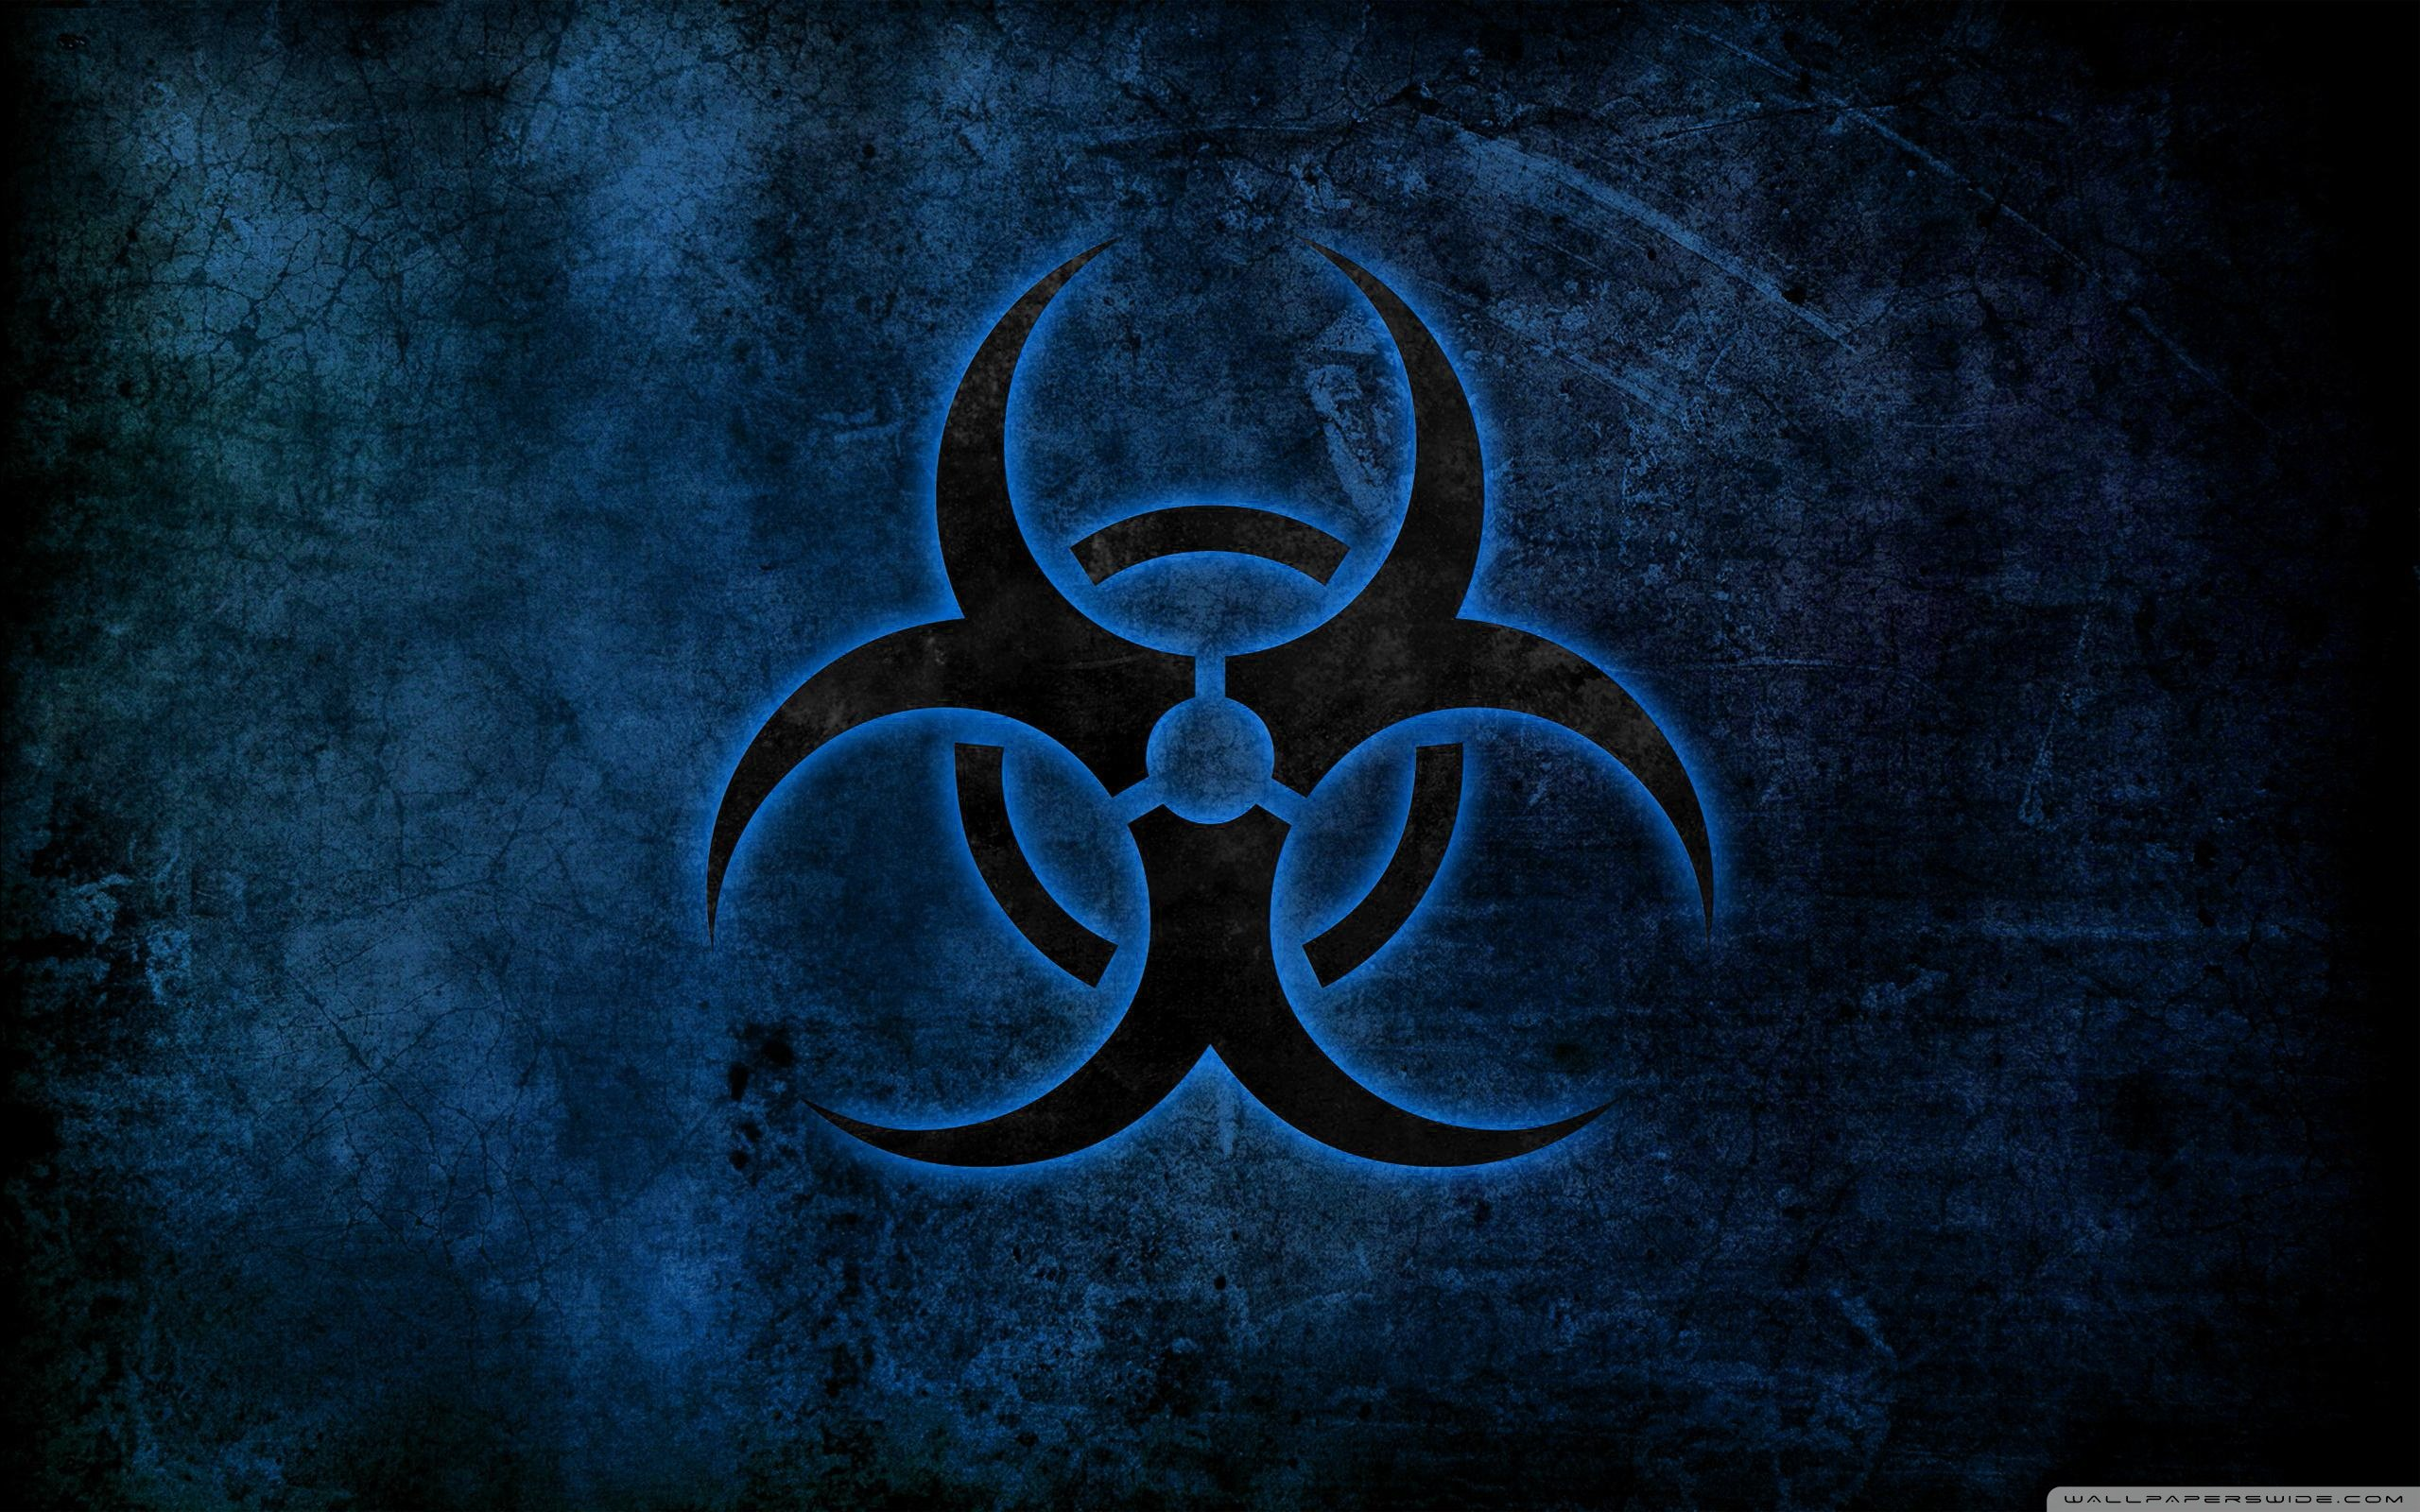 biohazard symbol wallpaper 2560x1600 wallpaper 2560x1600